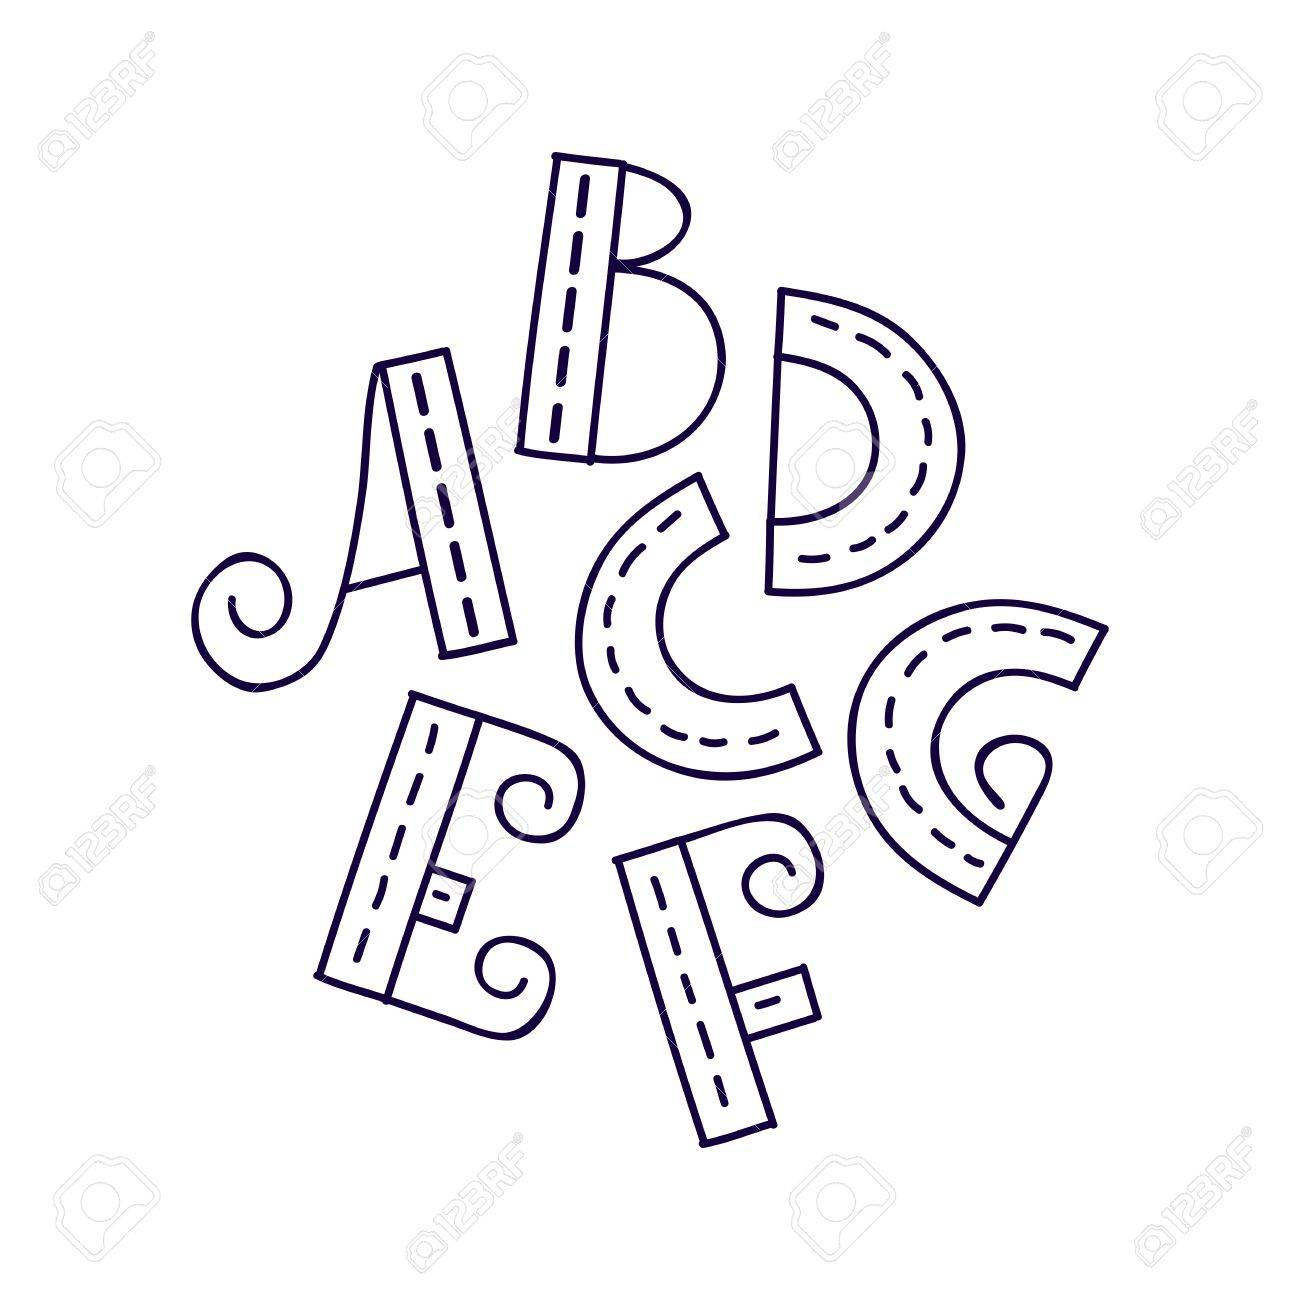 Hand drawn vector a b c d e f g letters doodle alphabet eps hand drawn vector a b c d e f g letters doodle alphabet eps 8 stock vector 71928509 thecheapjerseys Images